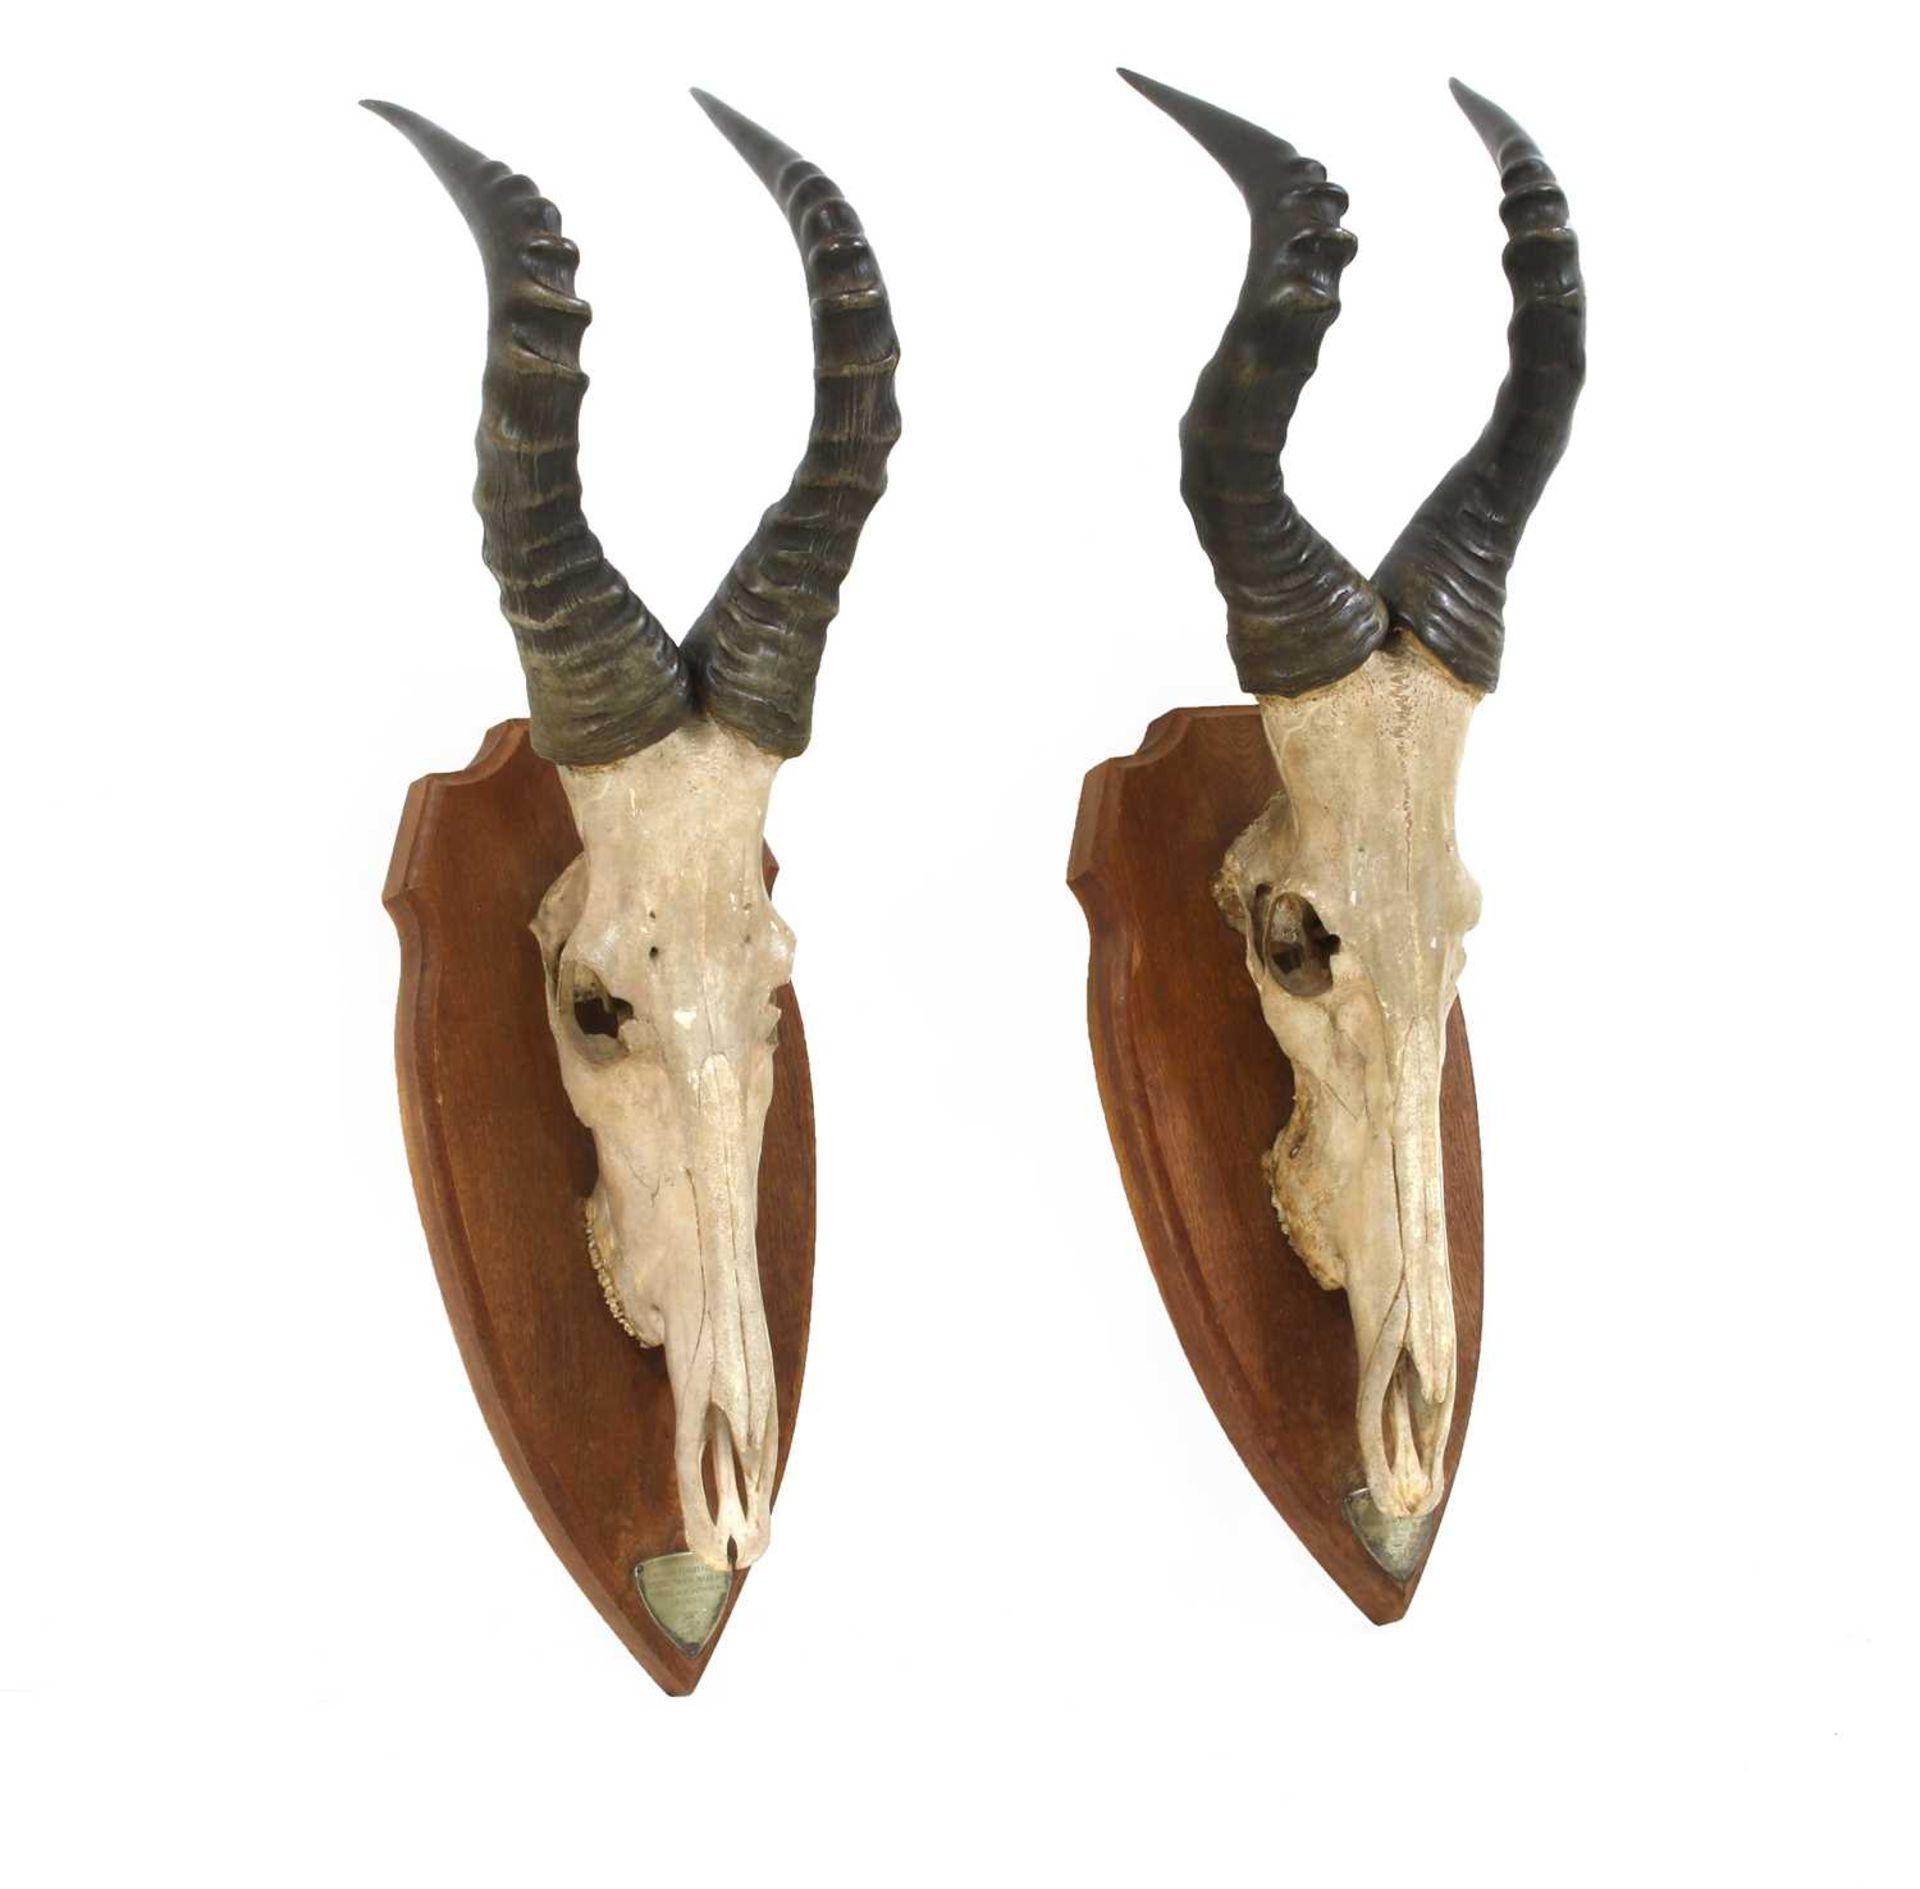 A pair of Jackson's Hartebeest skull trophy mounts, - Image 2 of 4